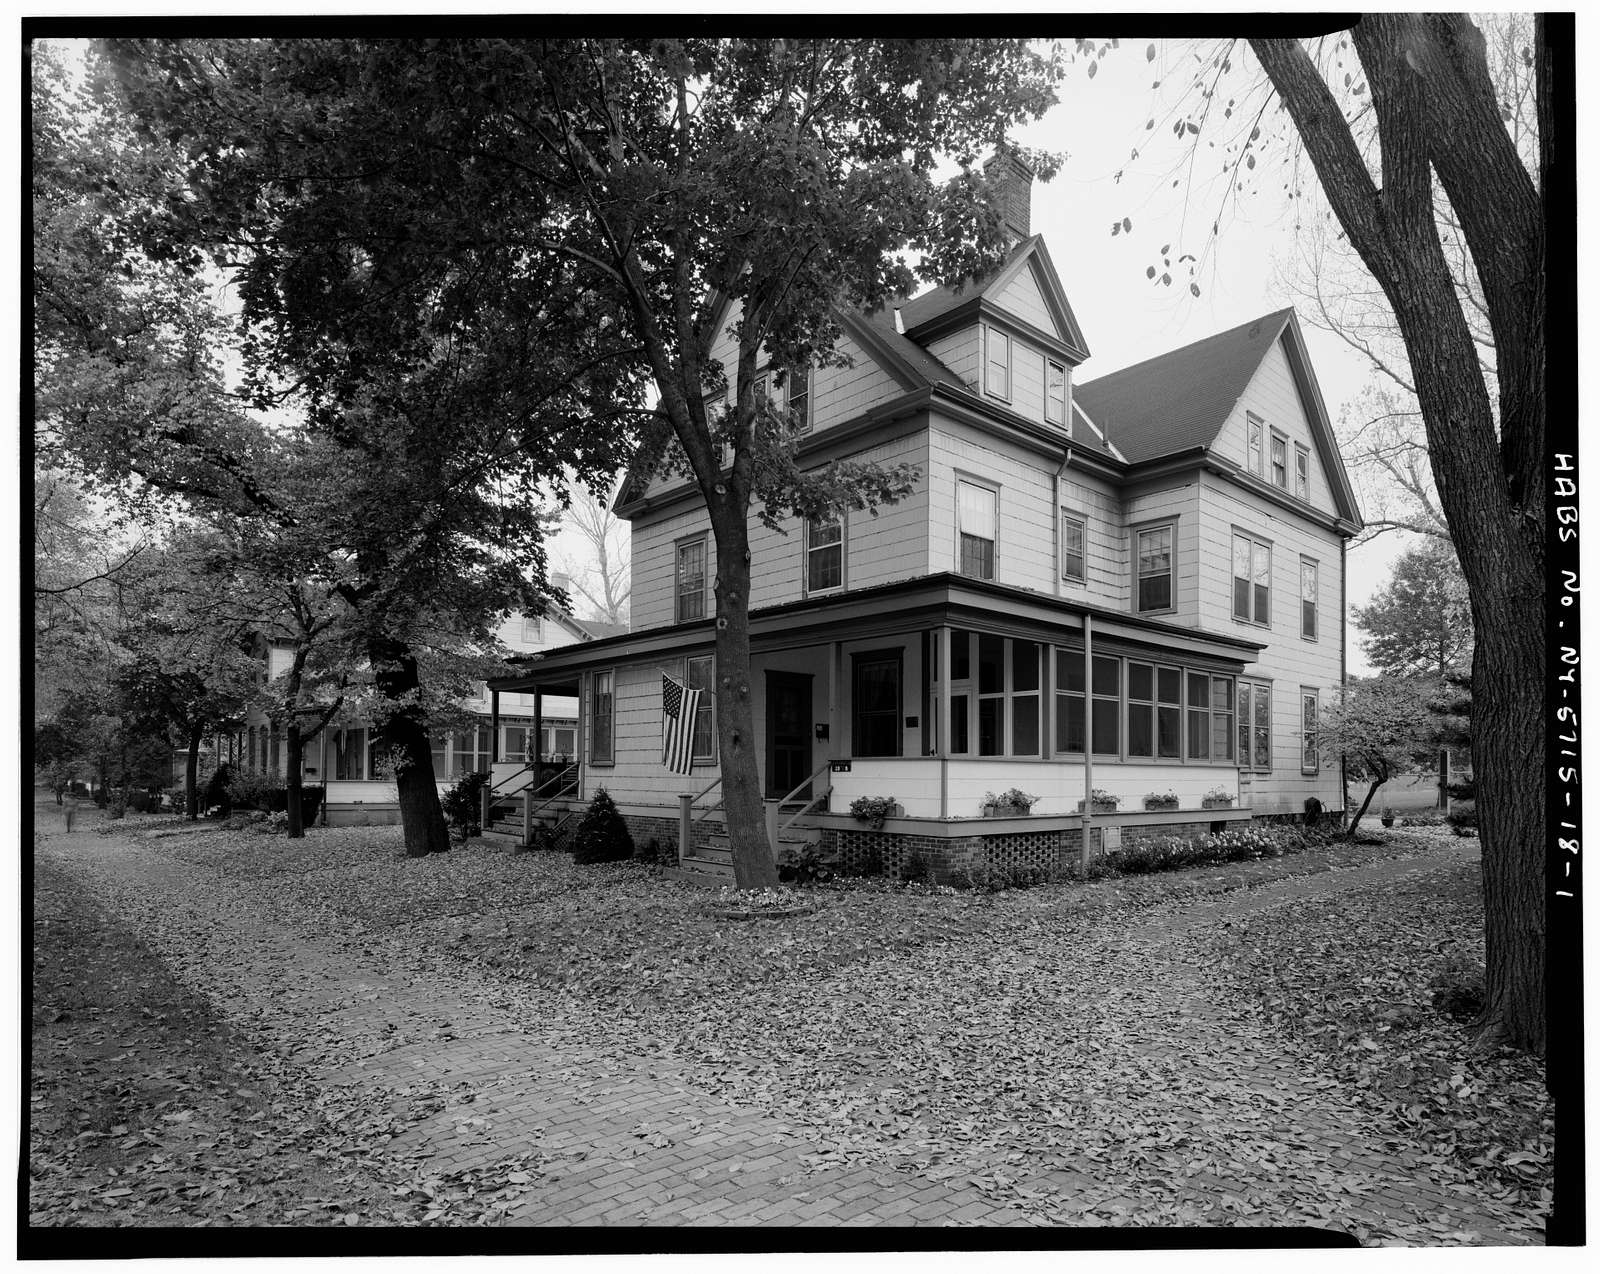 Governors Island, Quarters No. 20, New York Harbor, Nolan Park, New York, New York County, NY